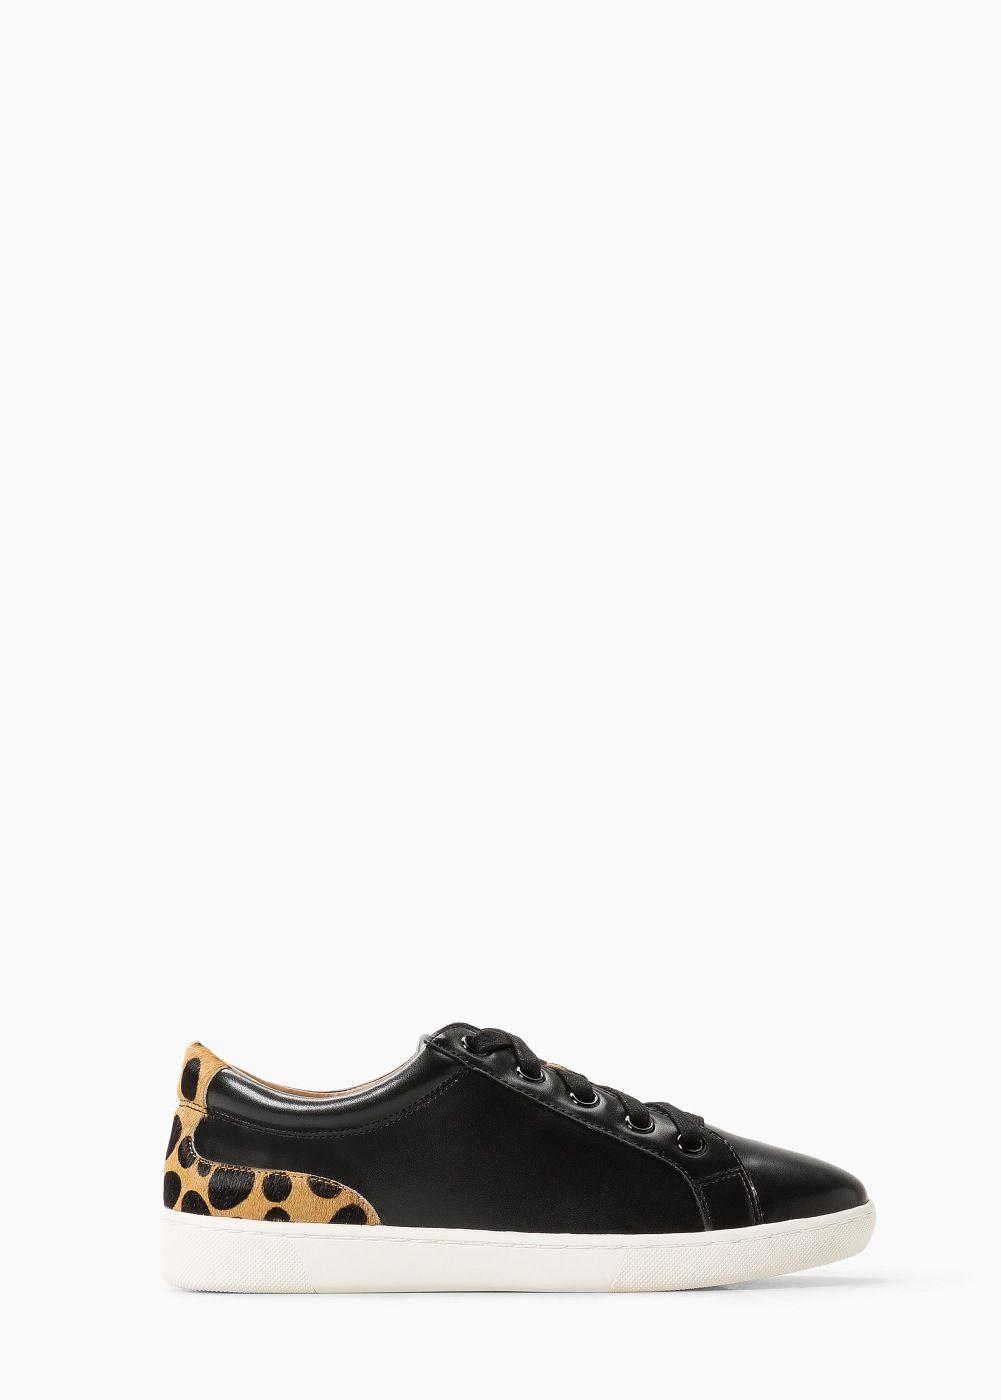 d89480ecdfa Acessórios · Sapatos · Leopard sneakers - Women